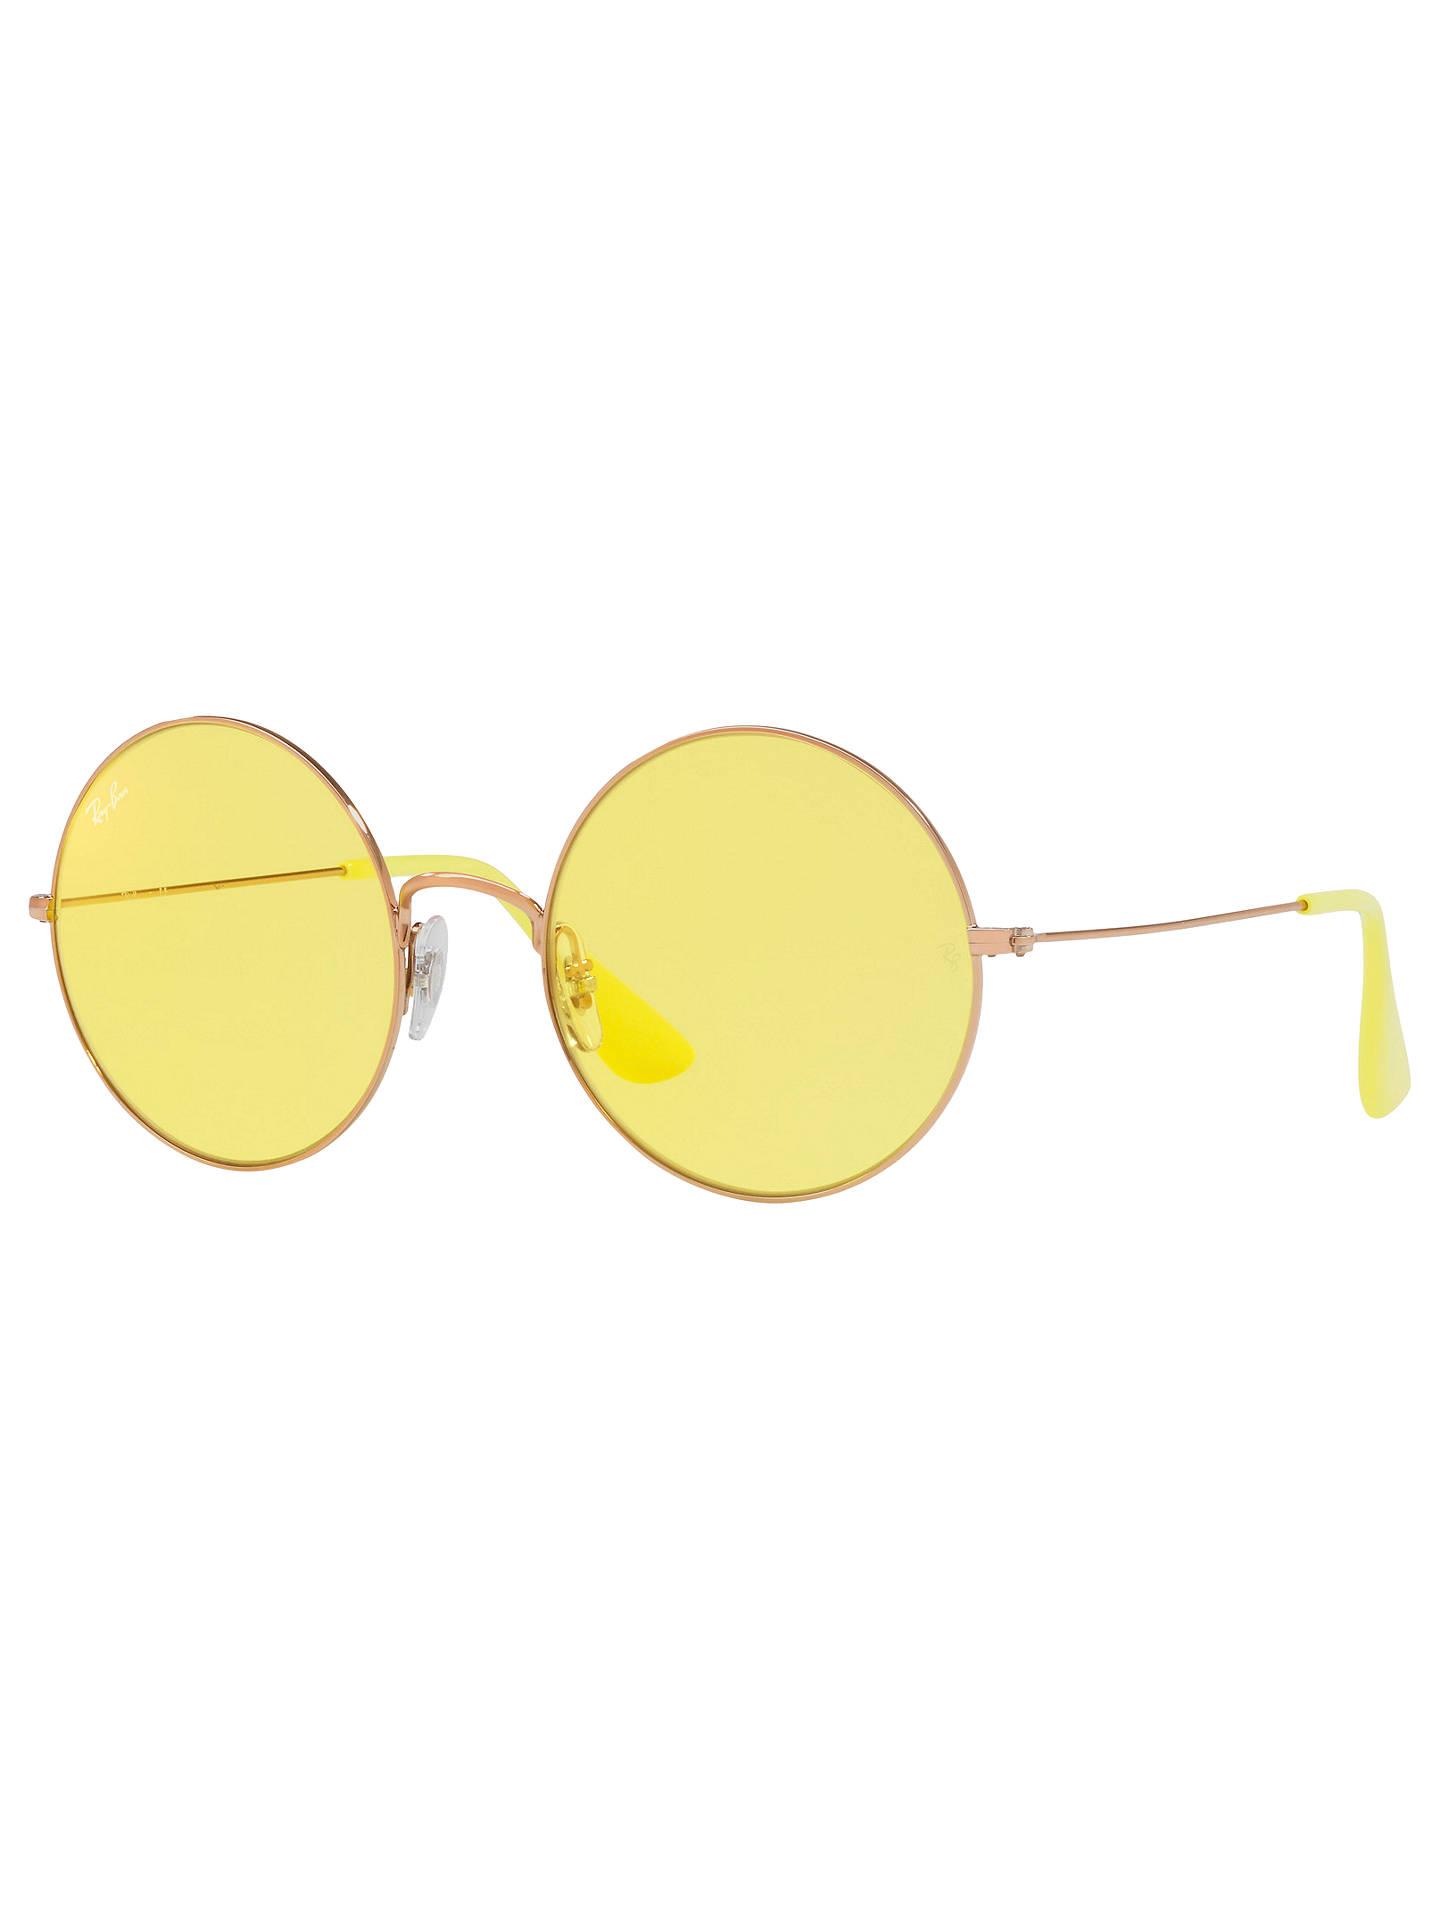 b6abe097593 BuyRay-Ban RB3592 Ja-Jo Round Sunglasses